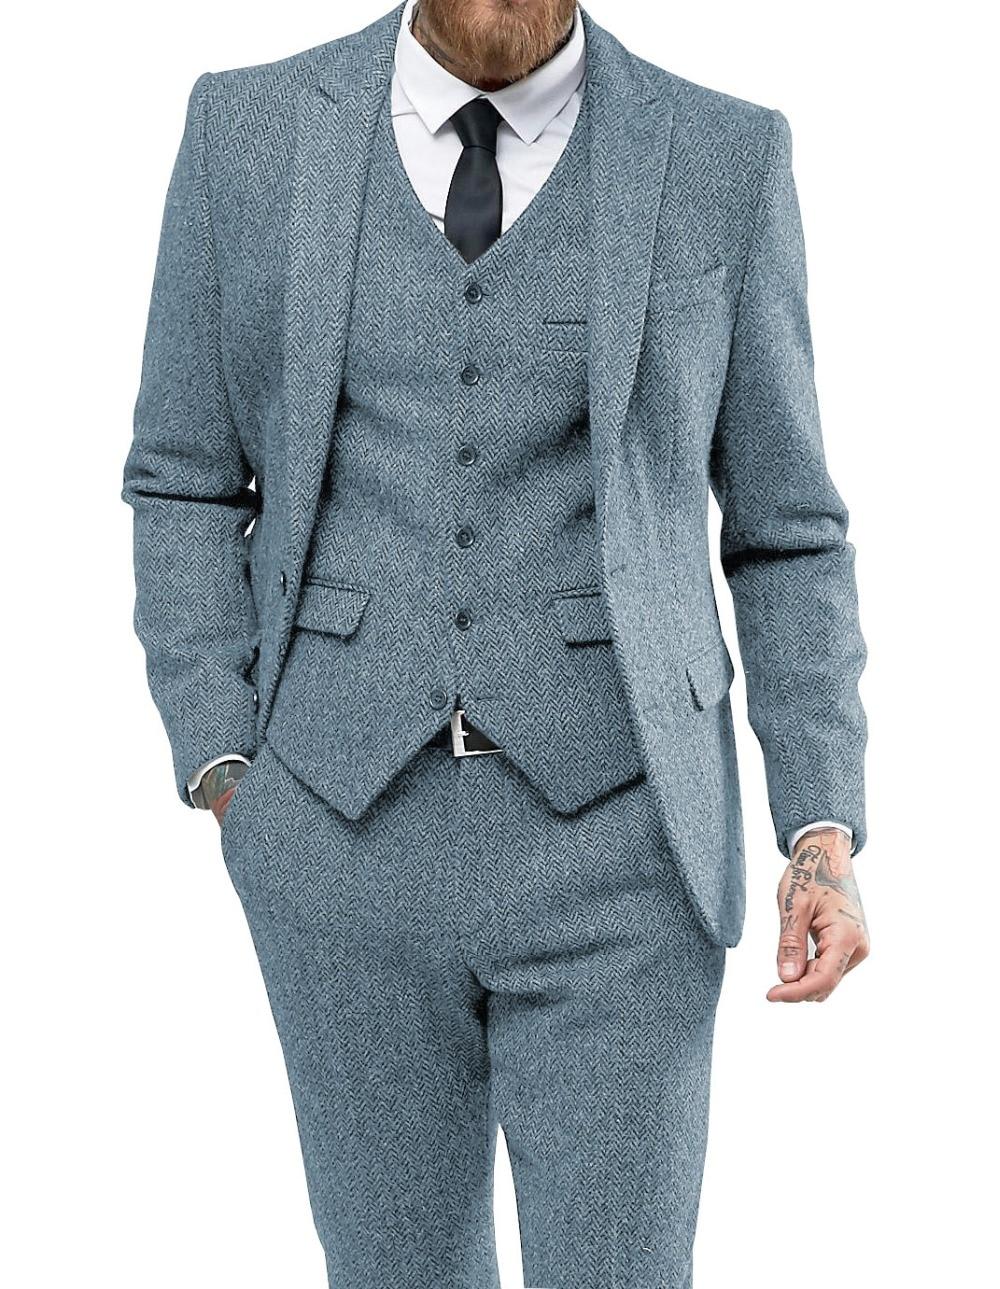 Men Suit Herringbon Casual Formal Three Piece Business Groomsmen Grey White Burgundy Lapel Tuxedos For Wedding Blazer+Pants+Vest